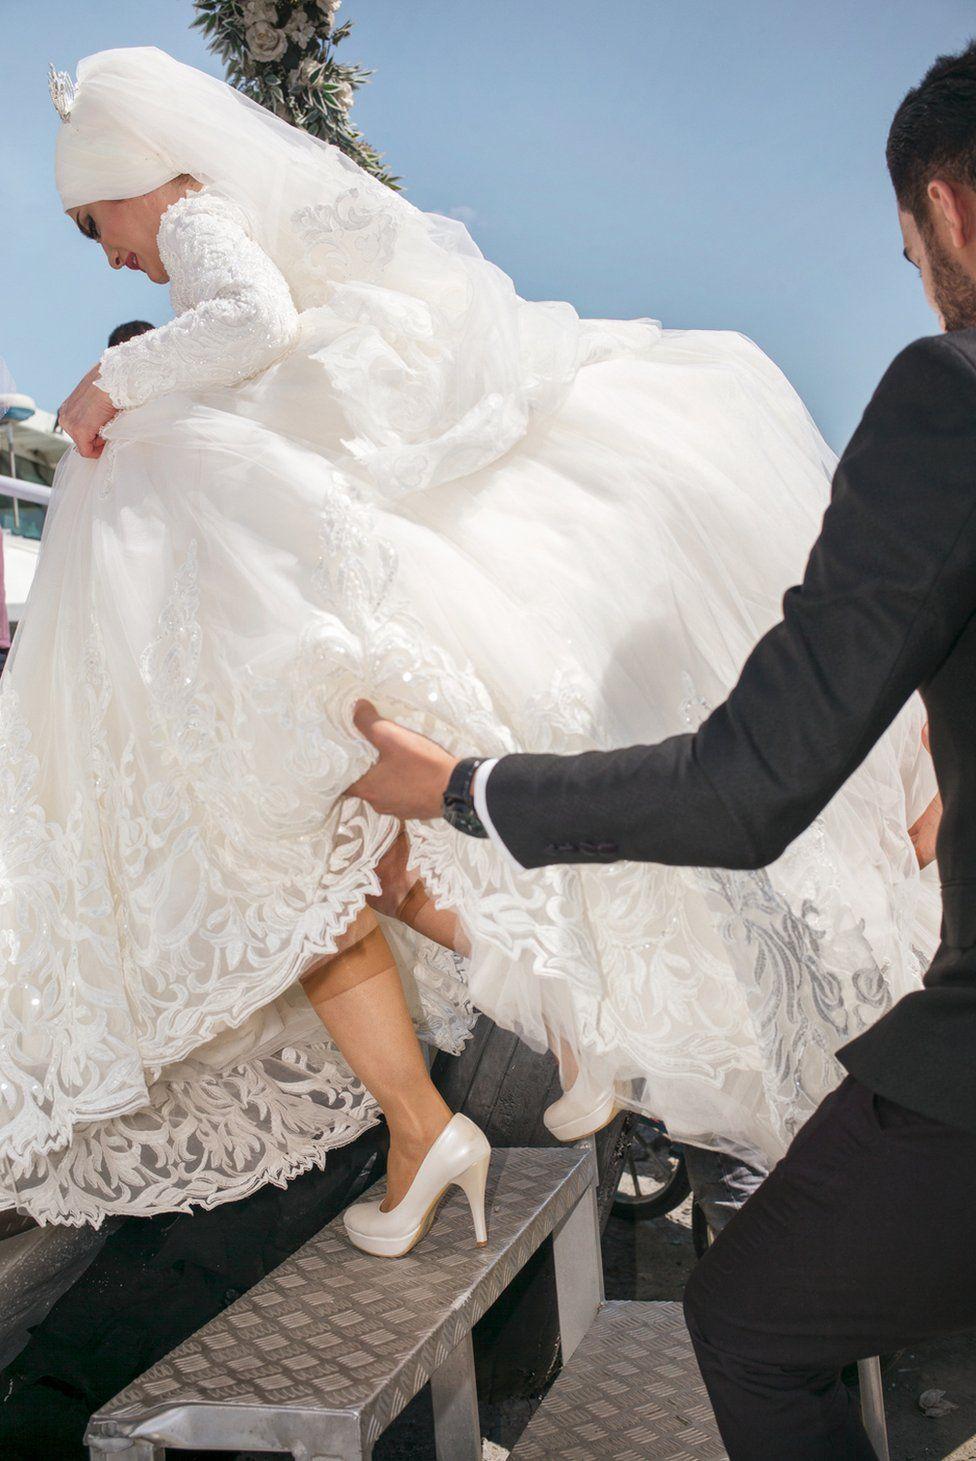 Bosphorus boat wedding party